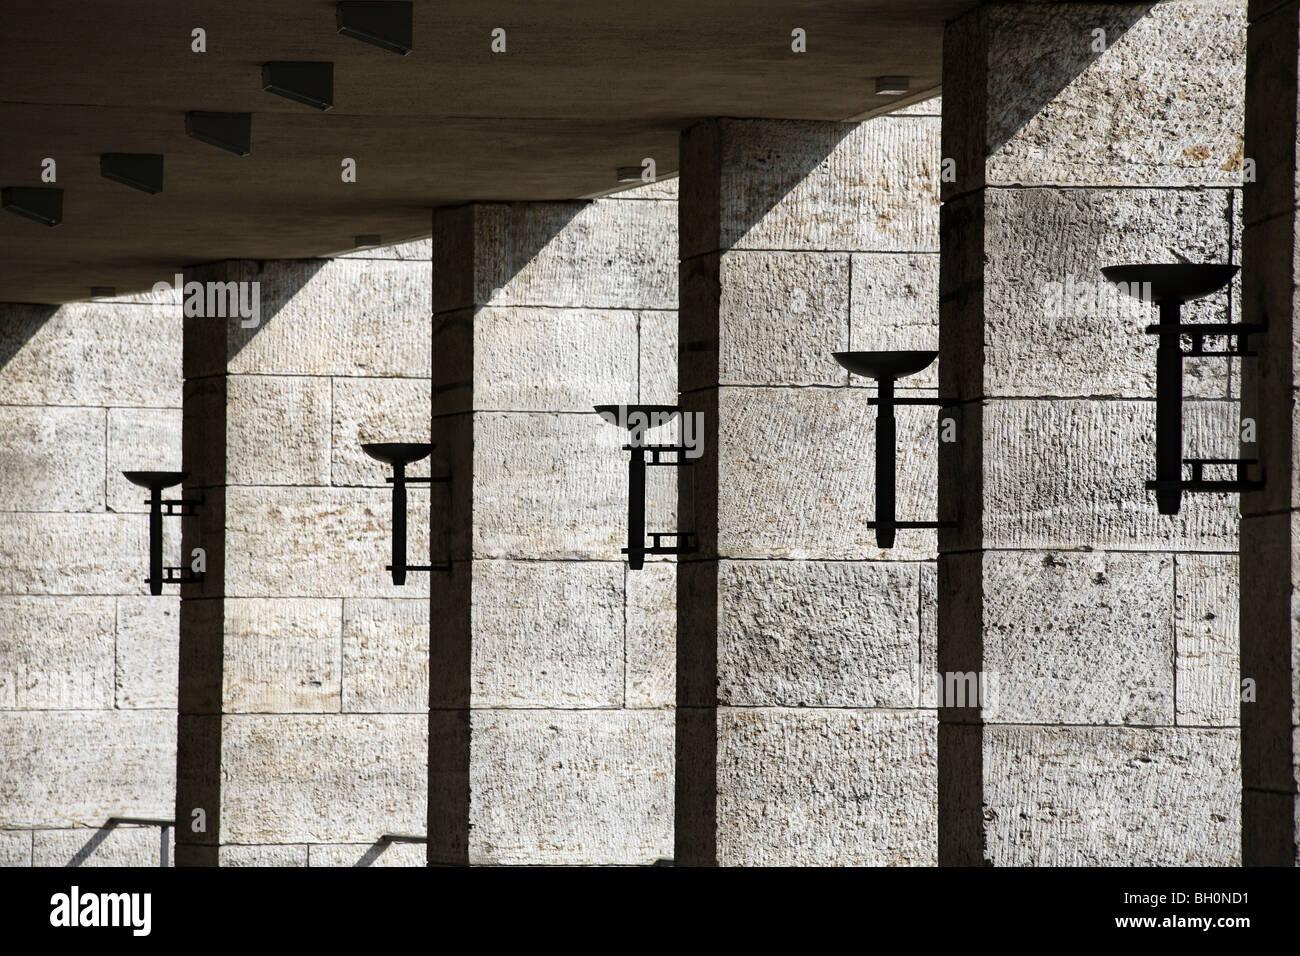 Berlin Olympiastadion Olympia Stadion Olympic Stadium - Stock Image